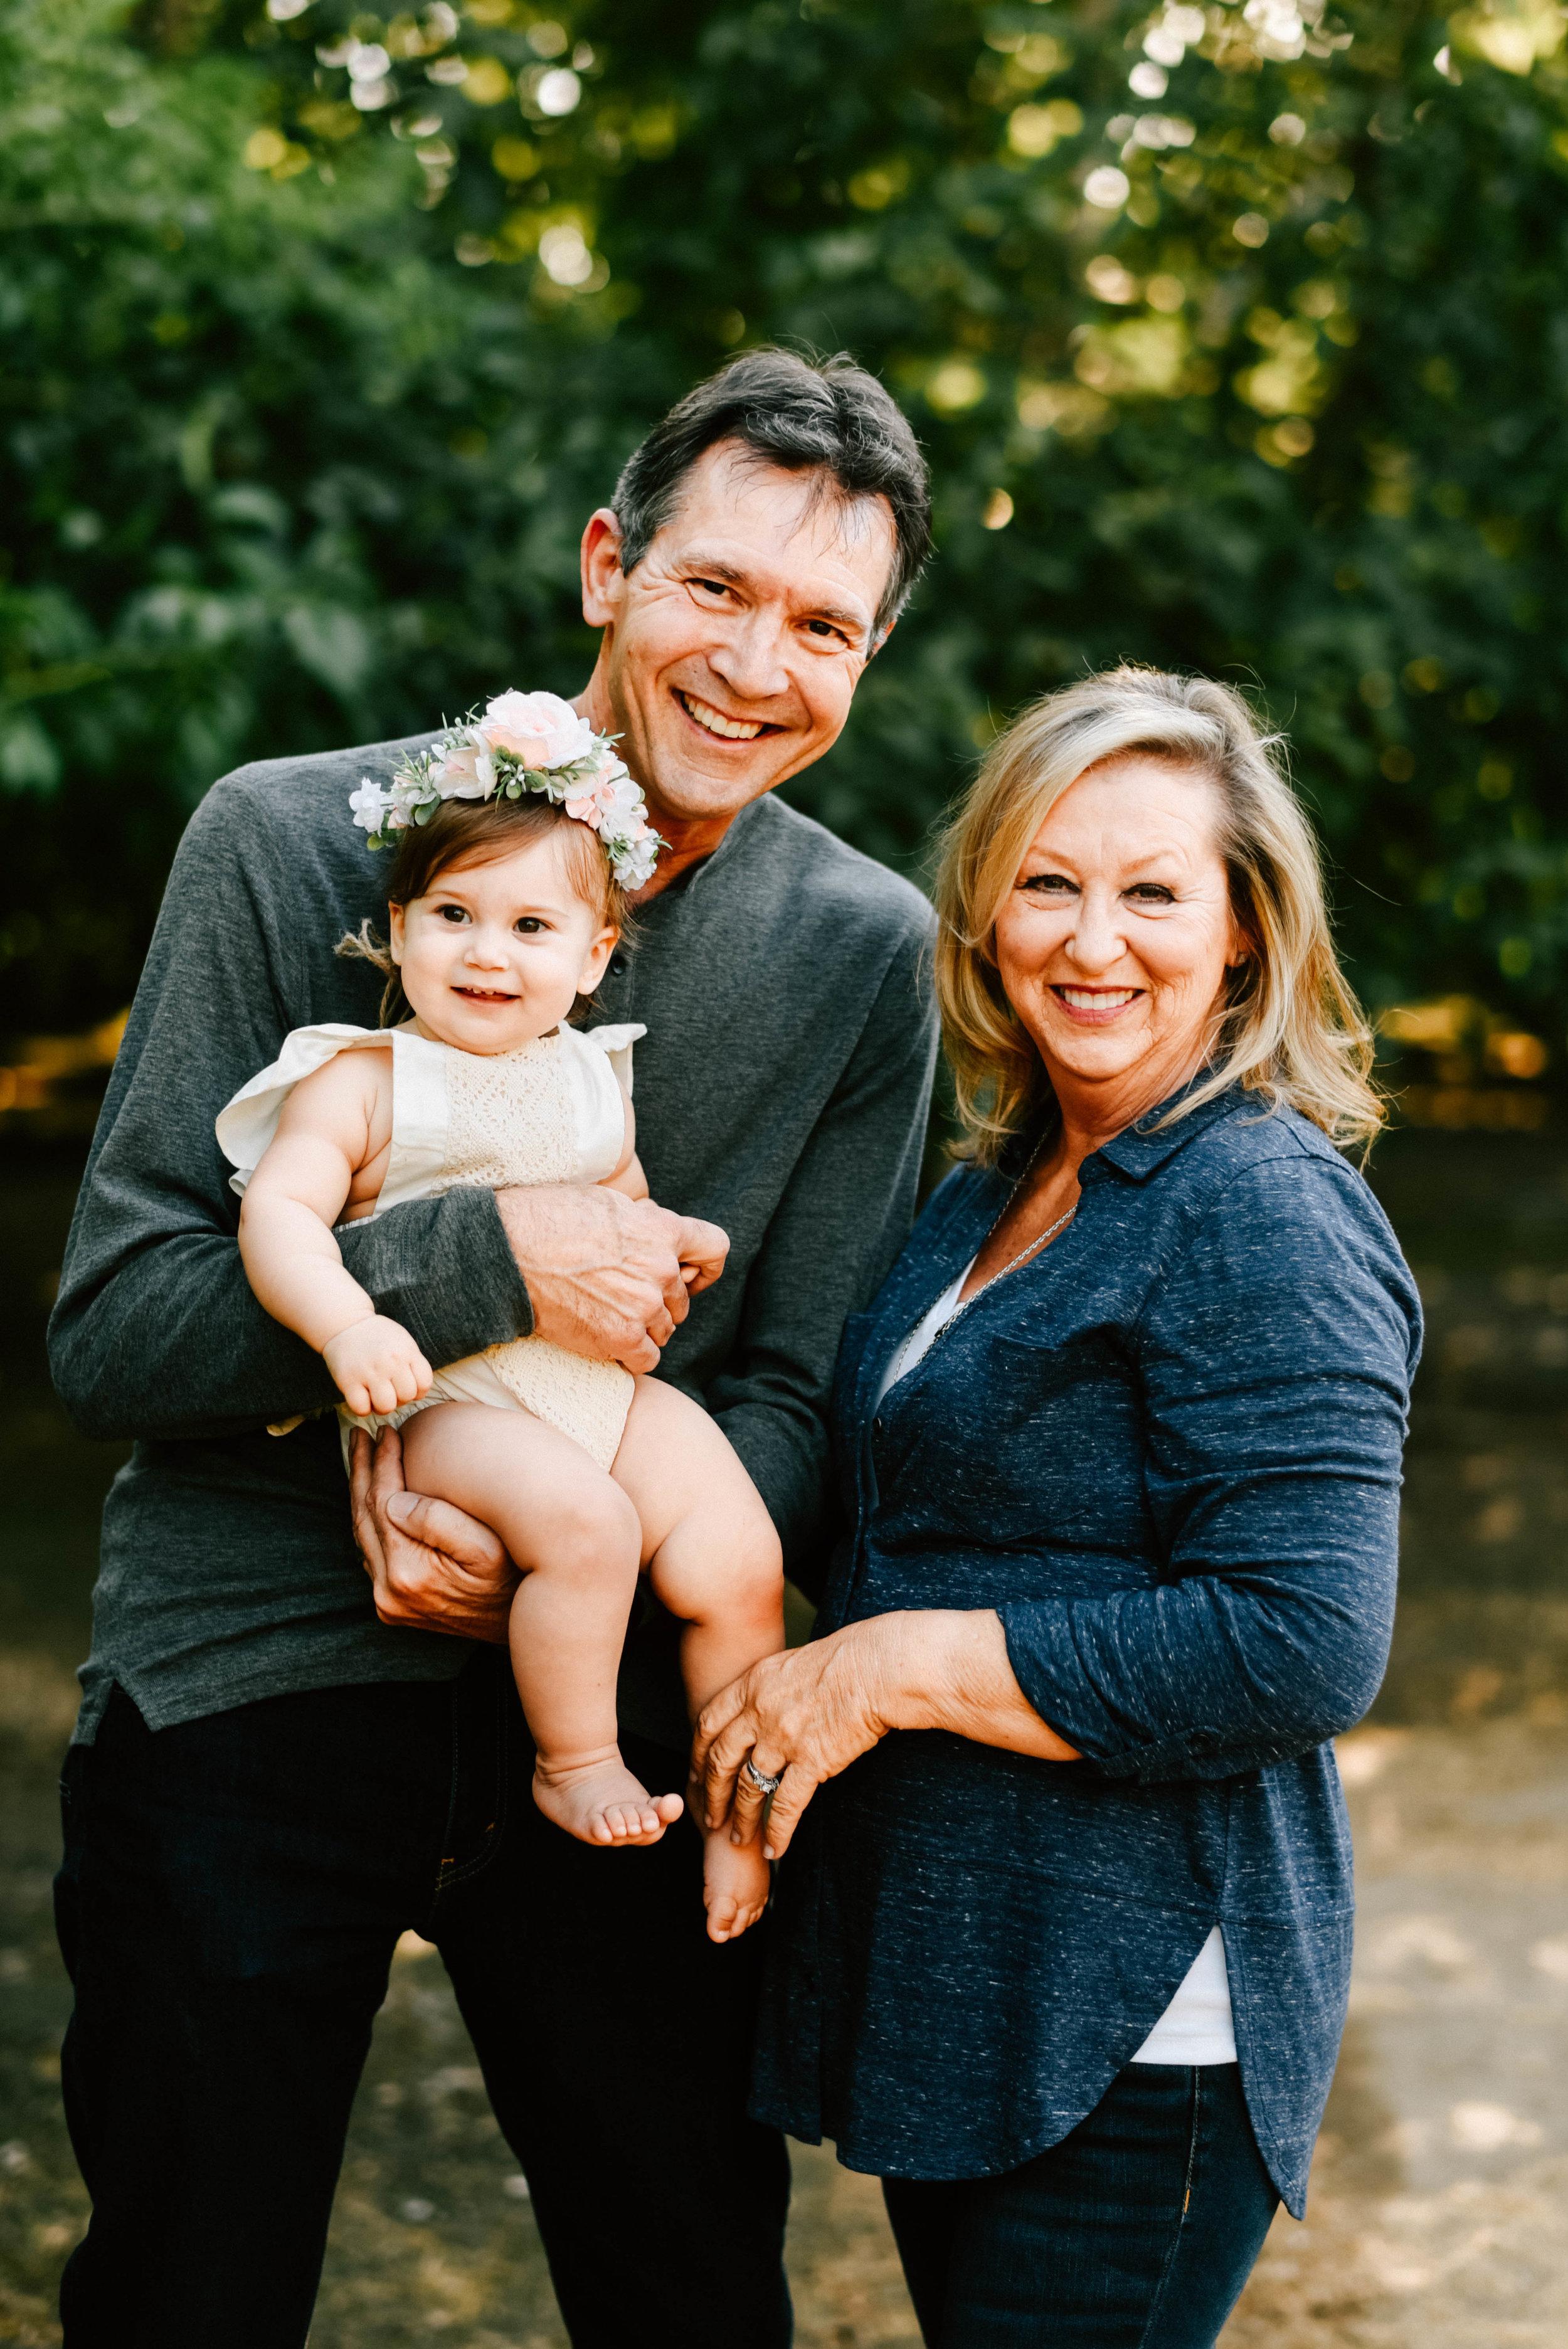 alyssajoyner+family-27.jpg